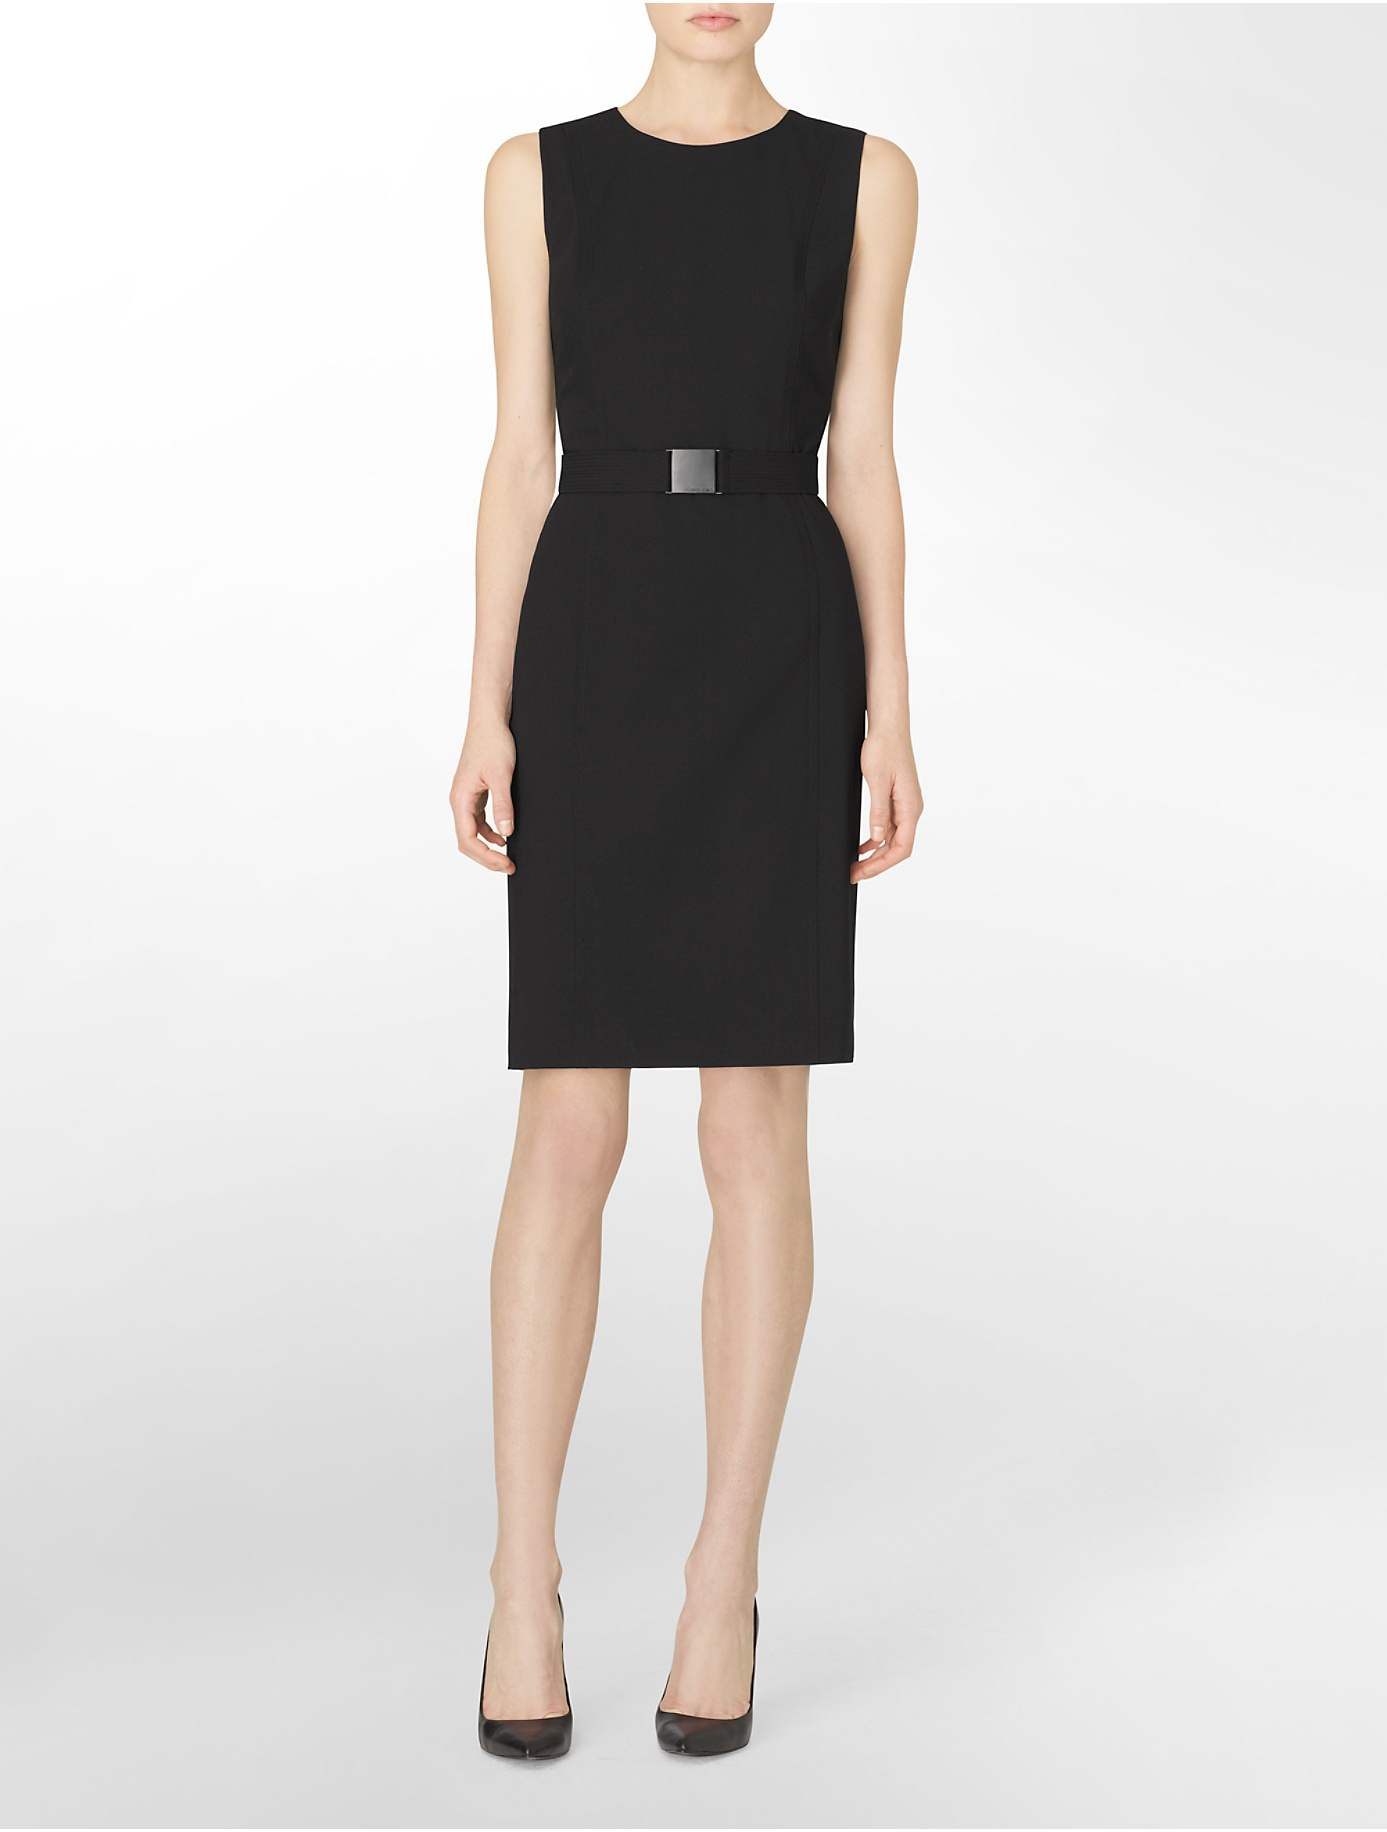 Женское платье Calvin Klein 14612544 闽台区域文化